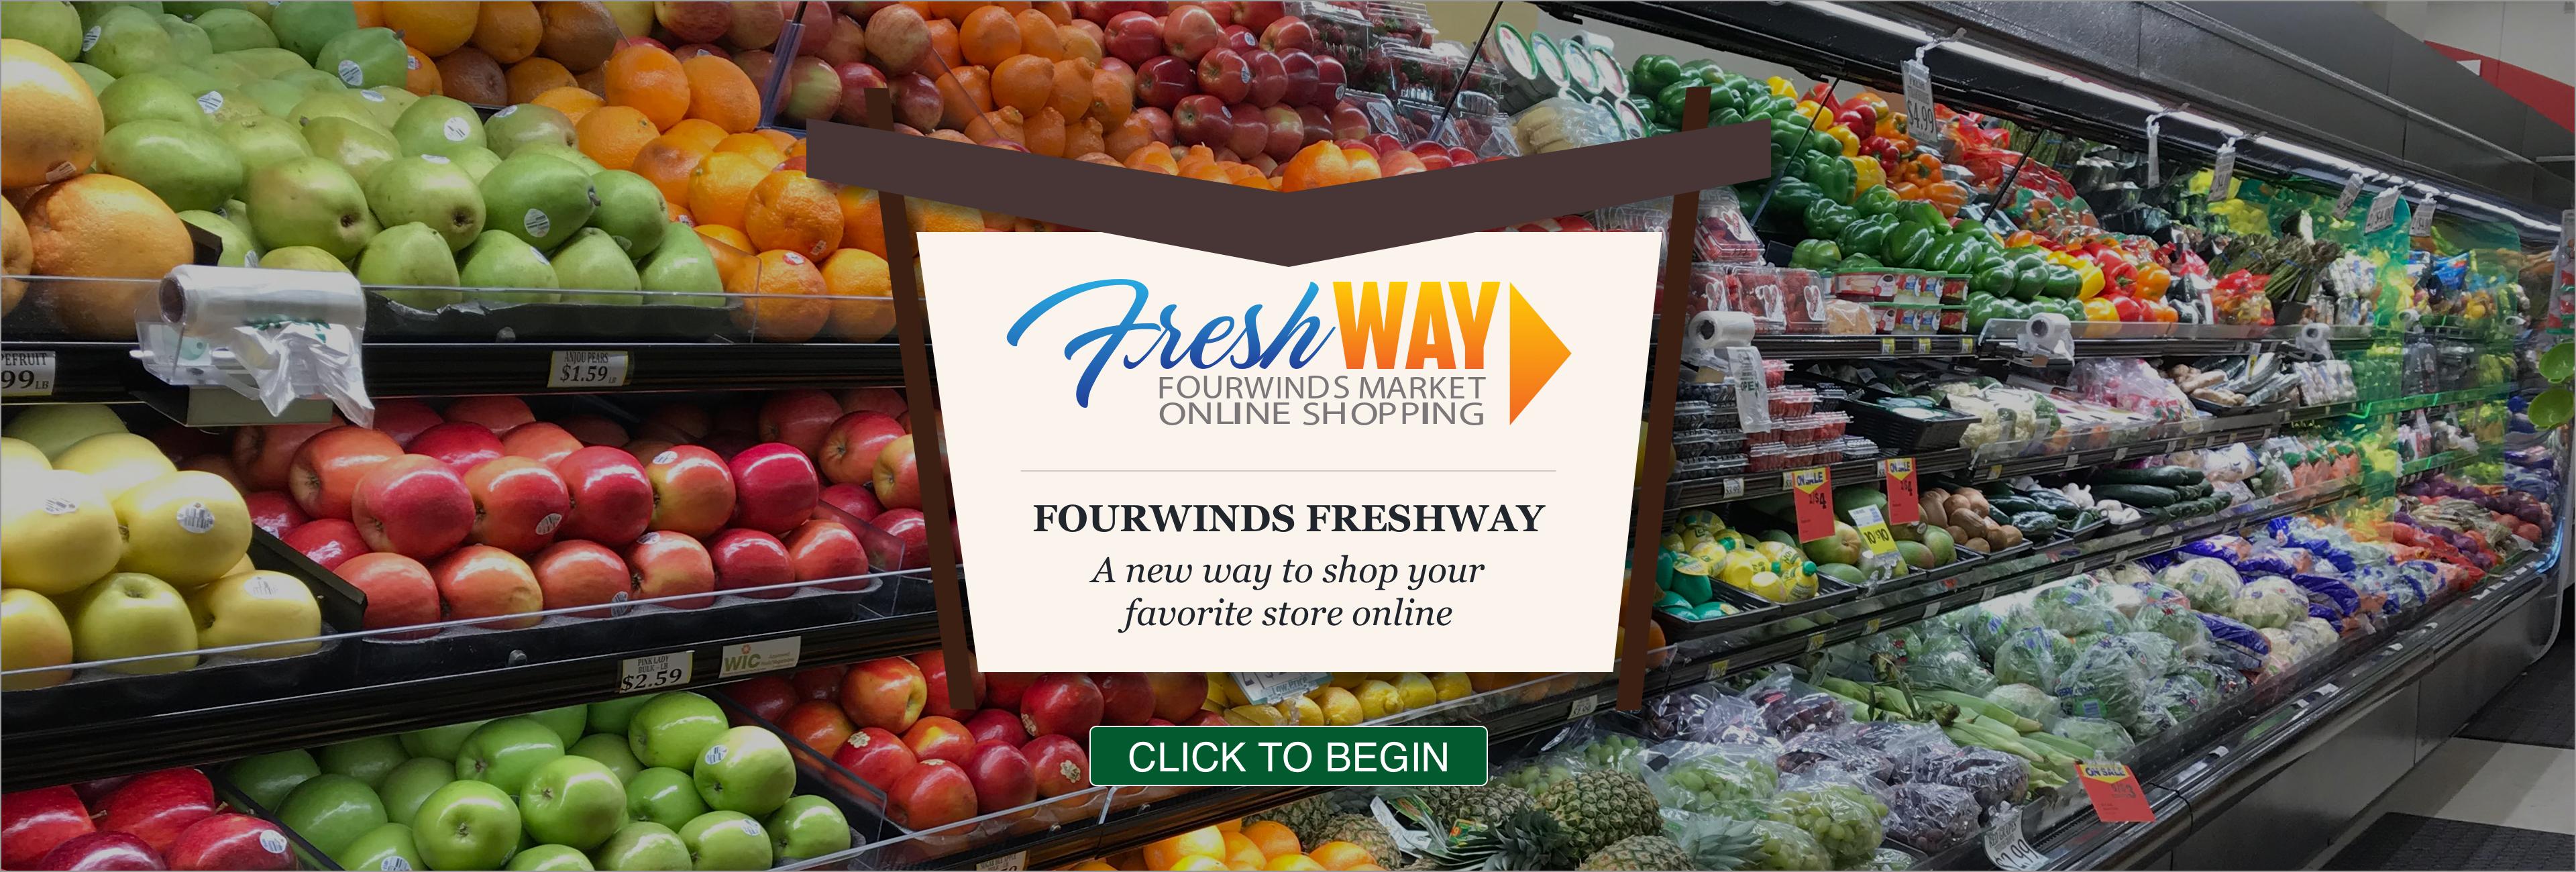 fourwinds-produce